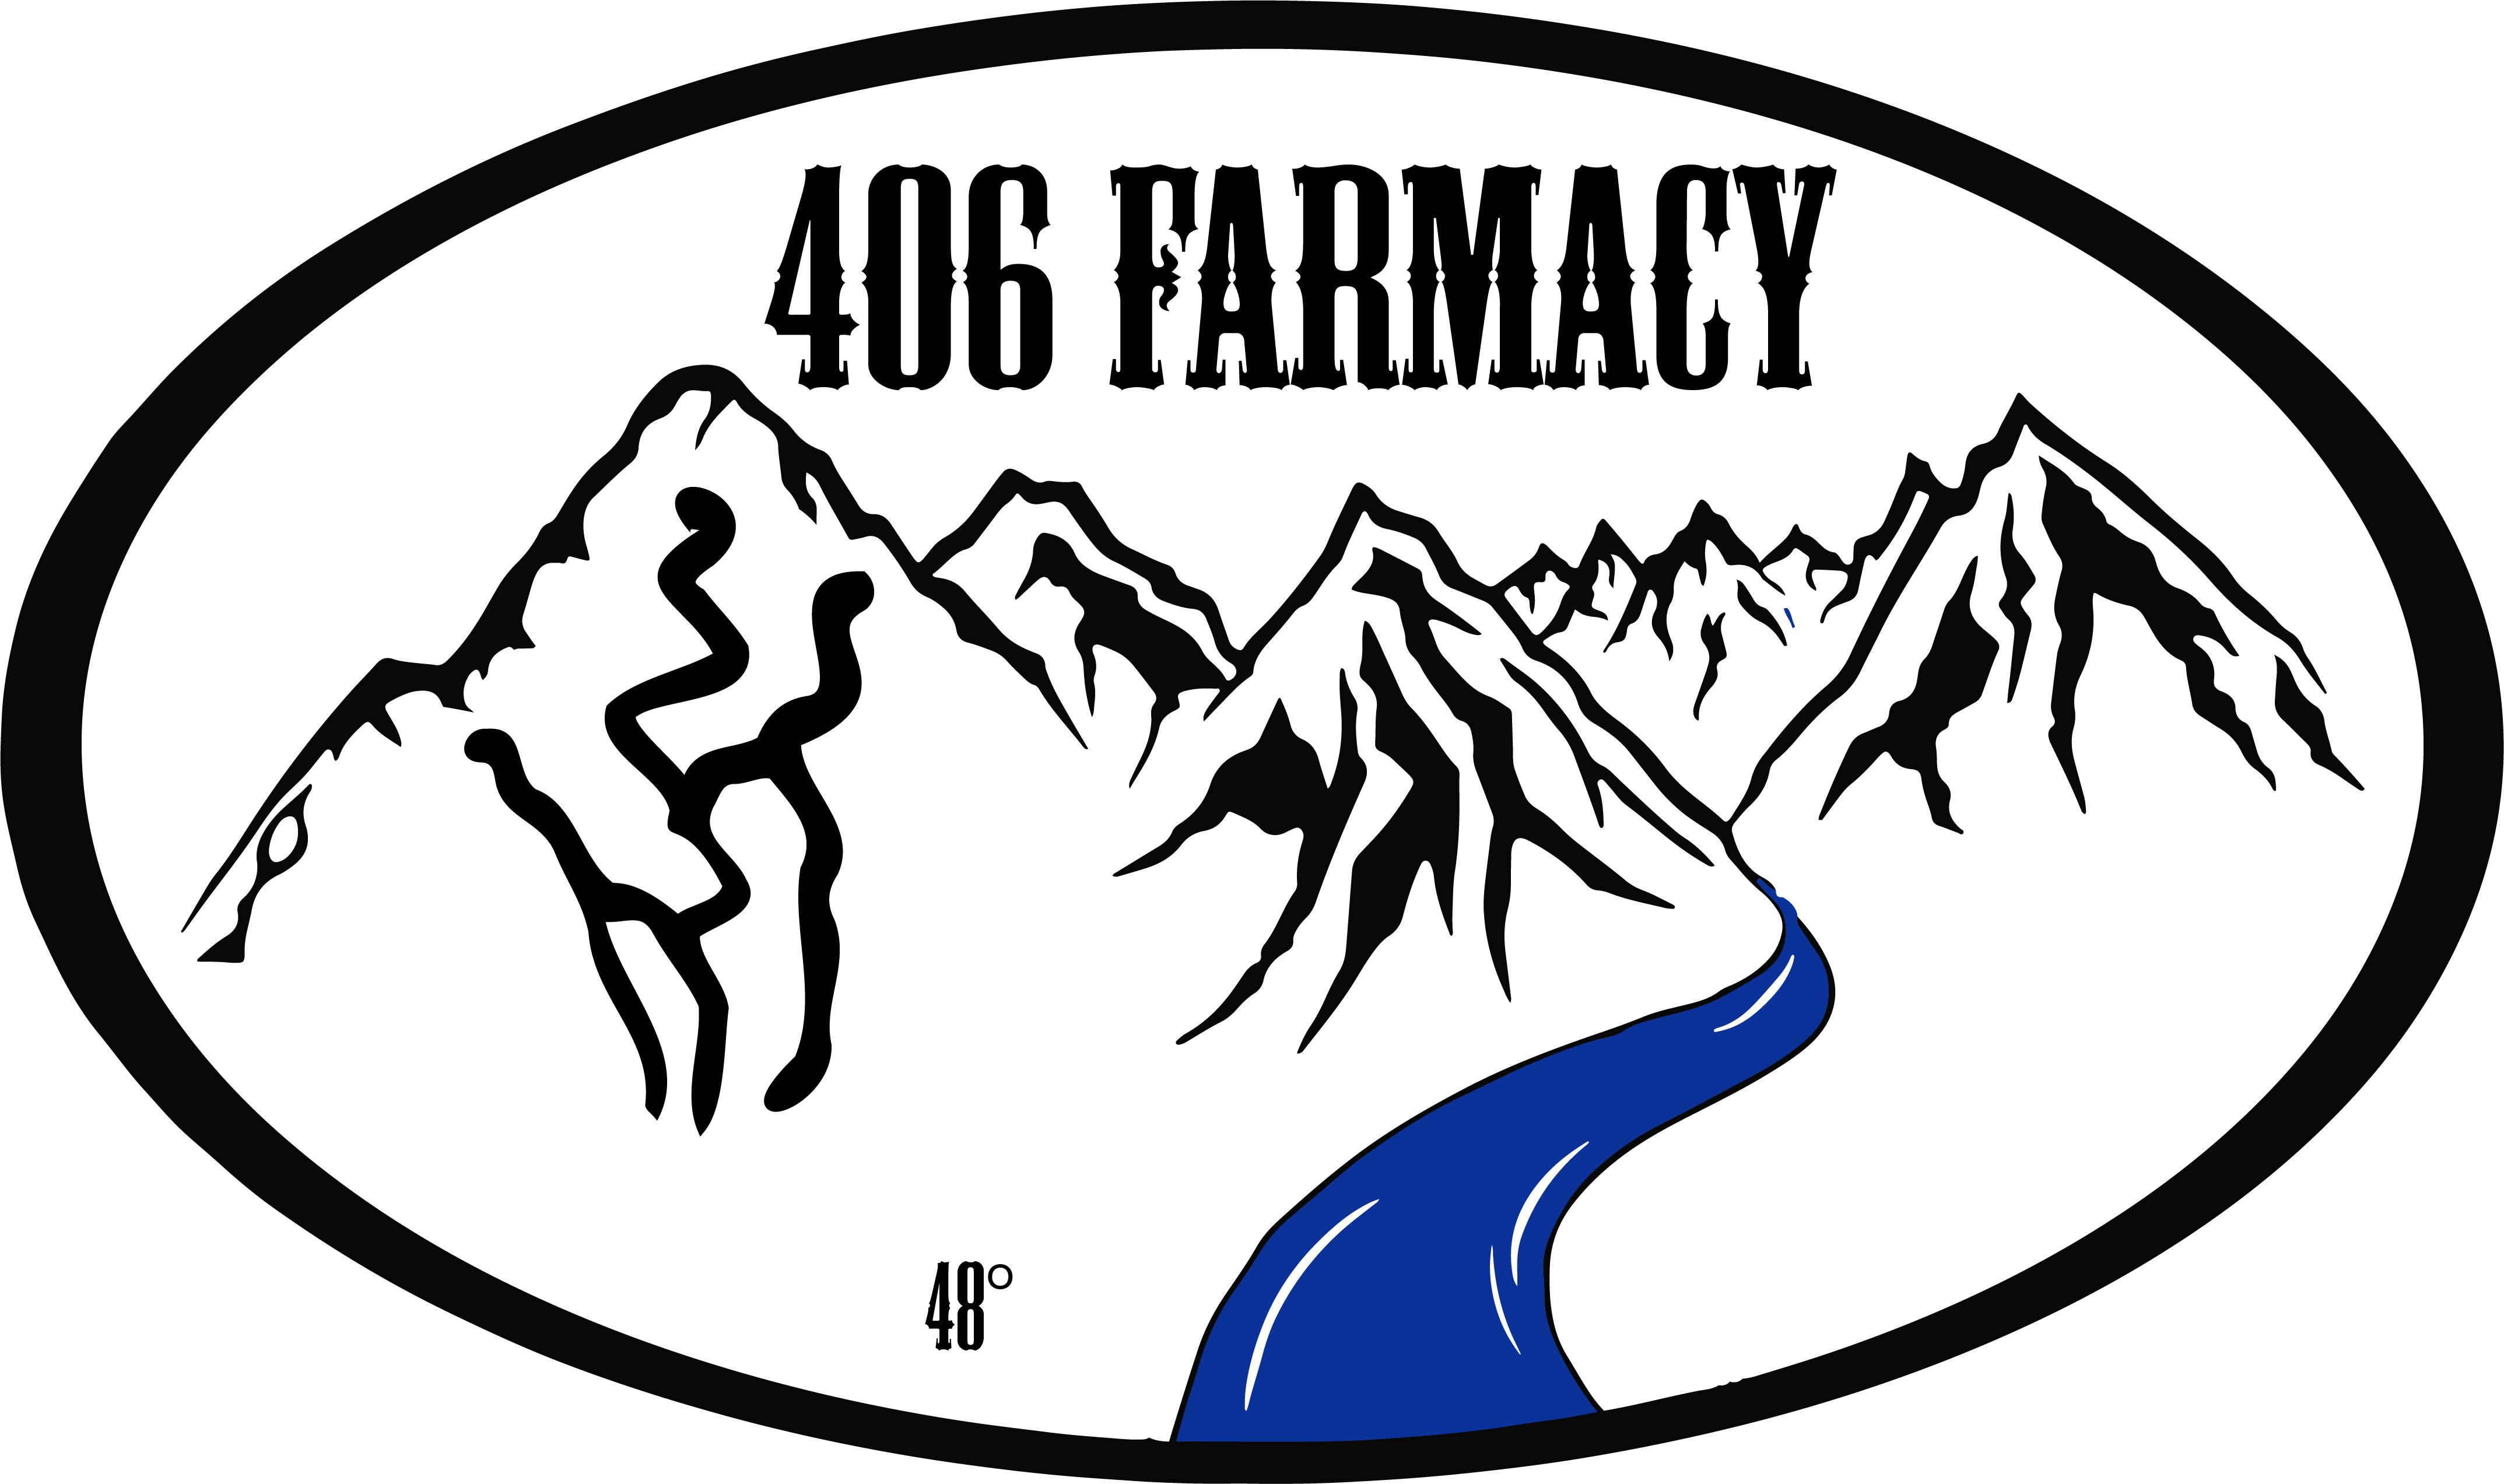 406 Farmacy